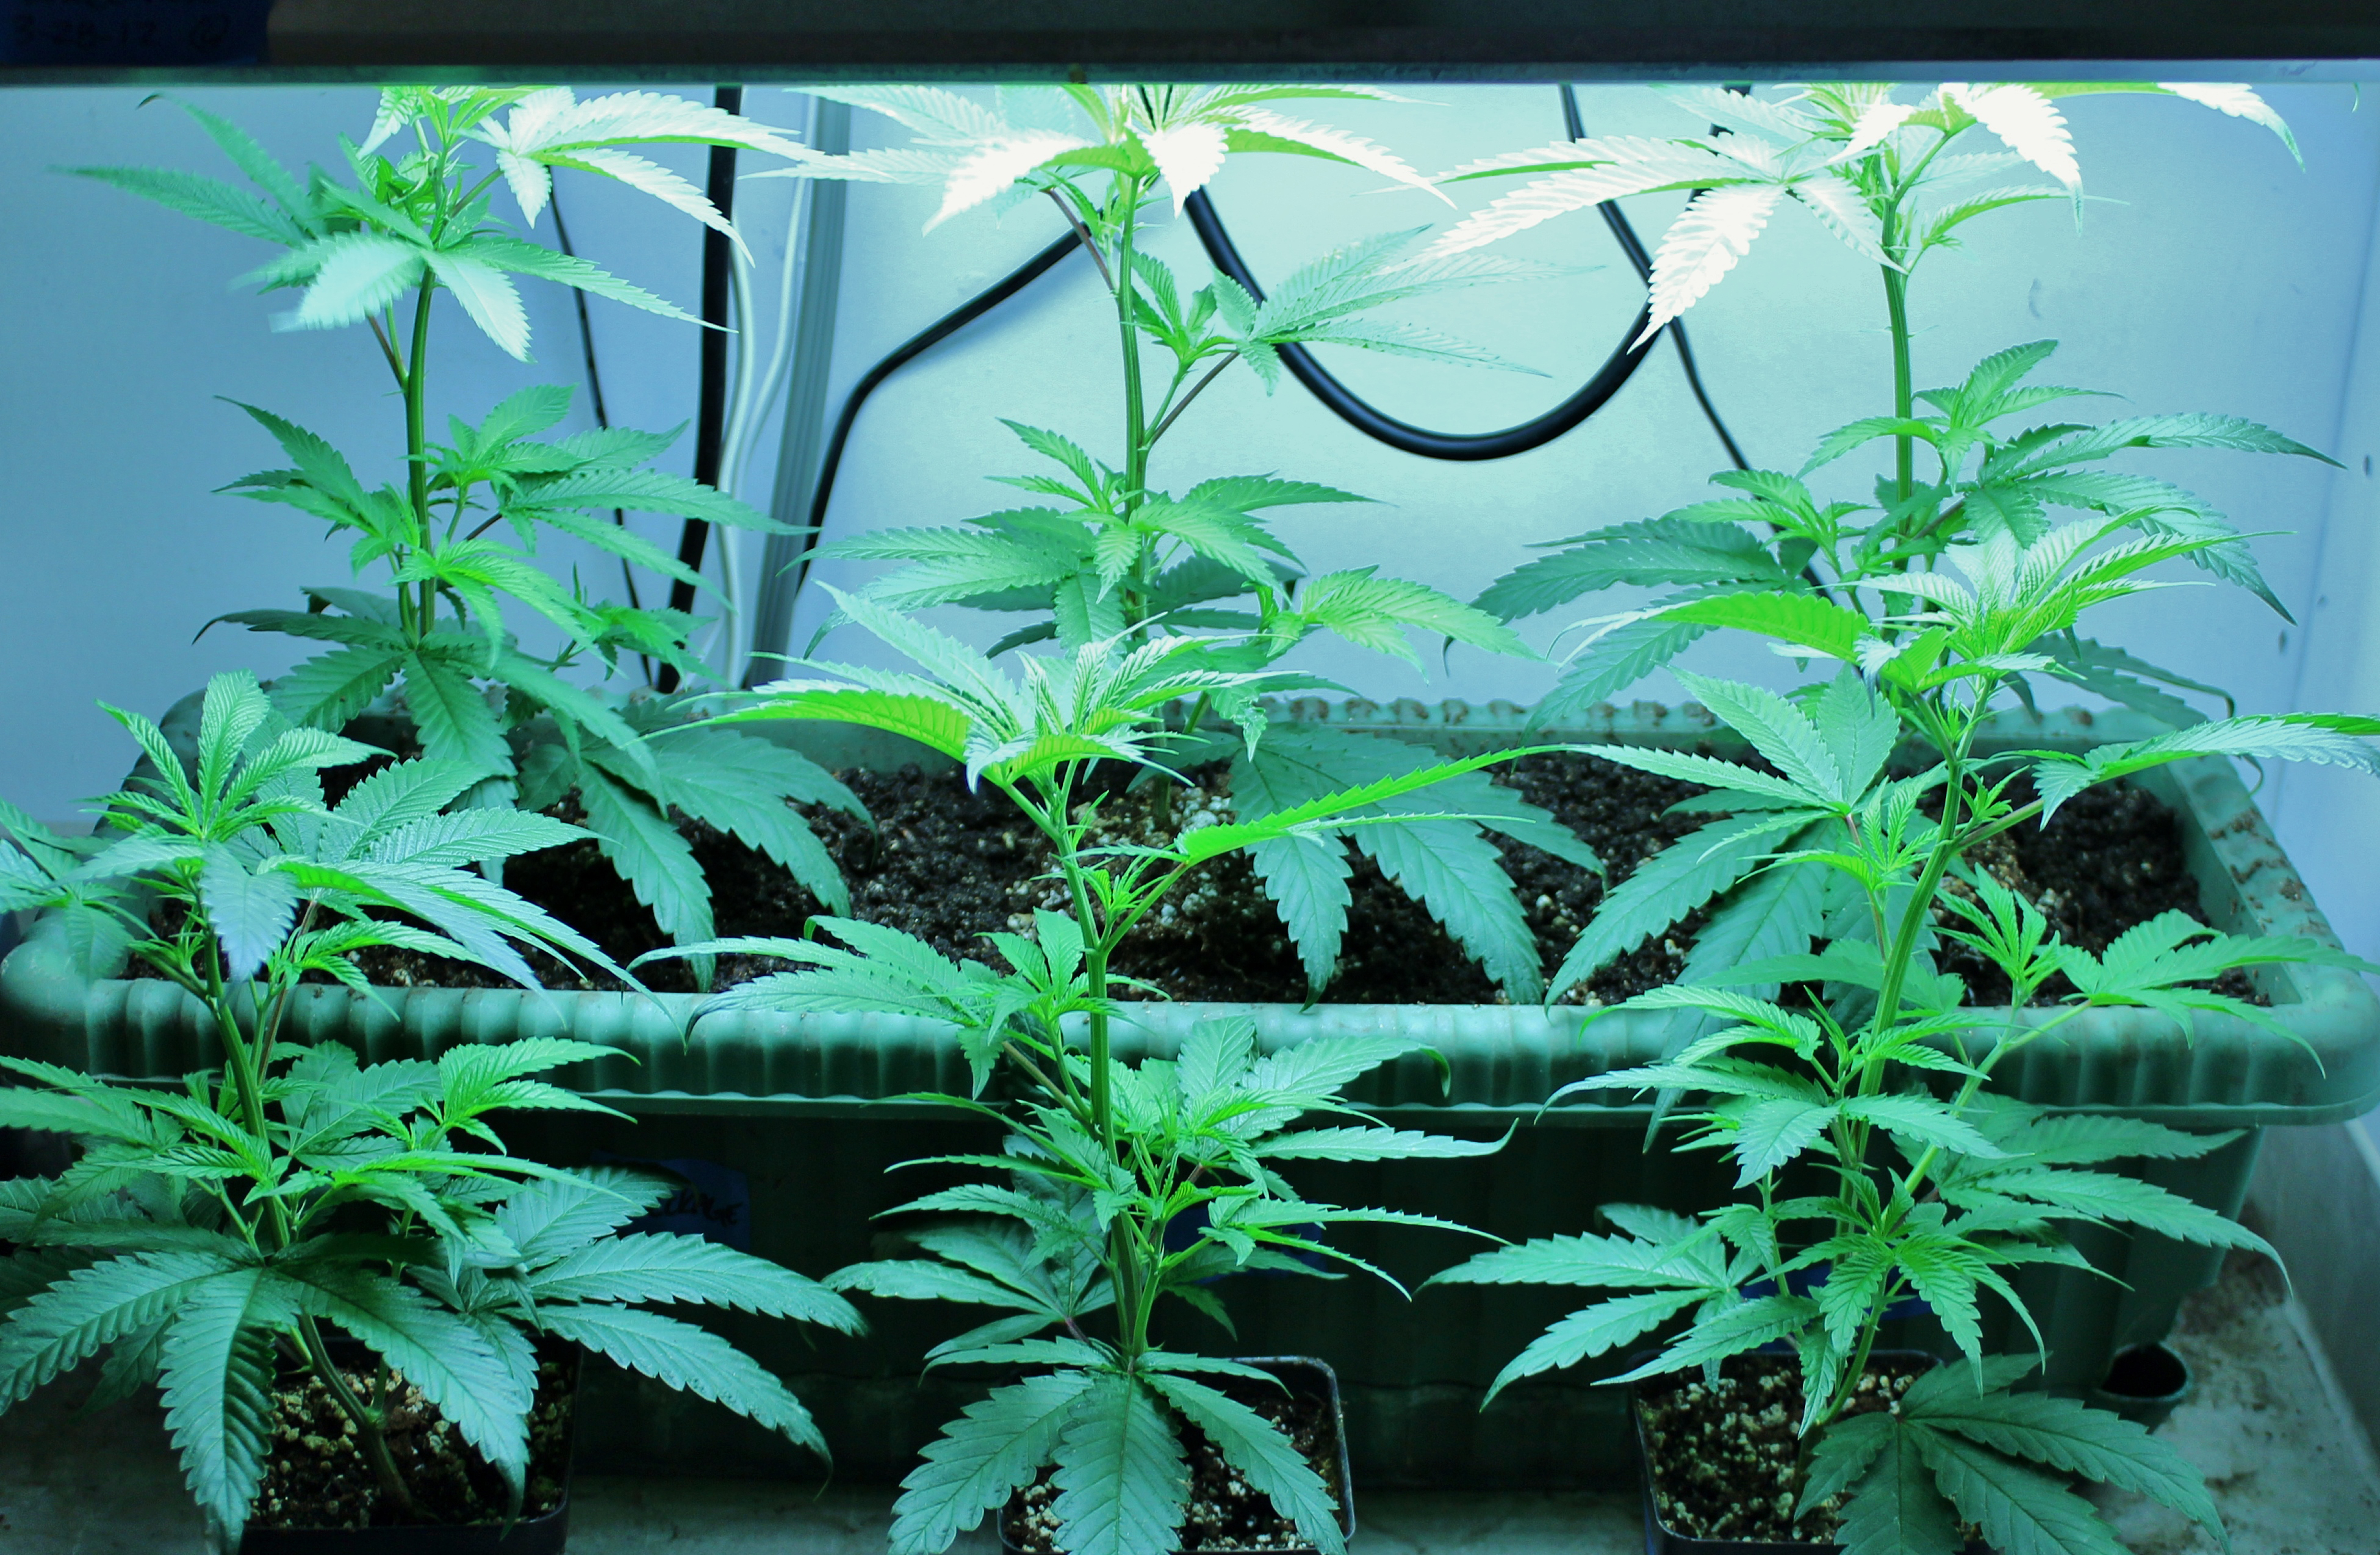 Freshly Planted Marijuana Clones